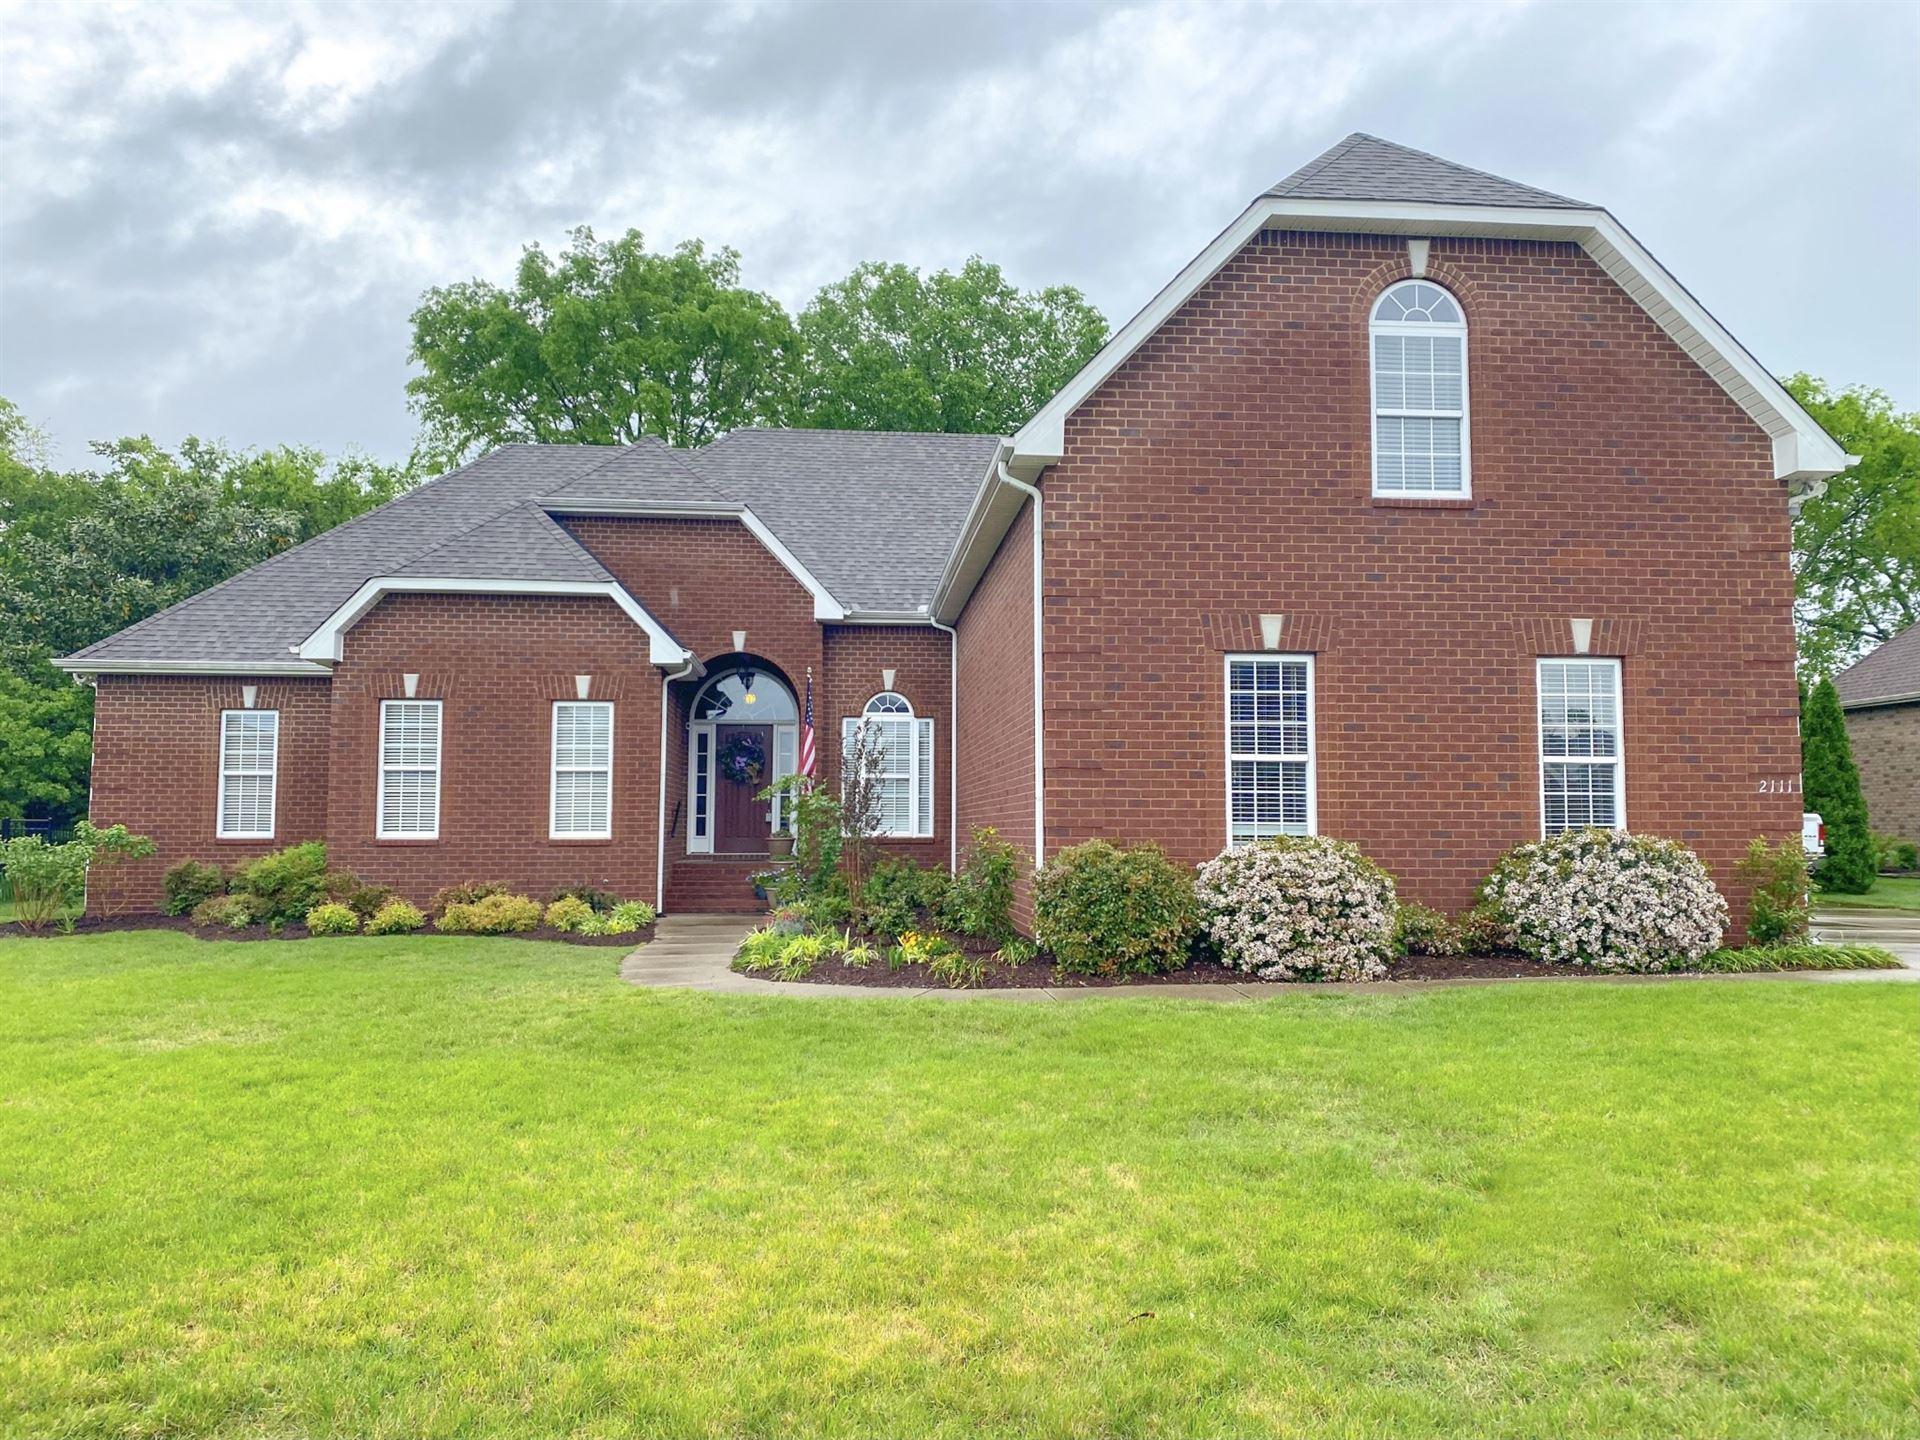 2111 Higgins Lane, Murfreesboro, TN 37130 - MLS#: 2271800